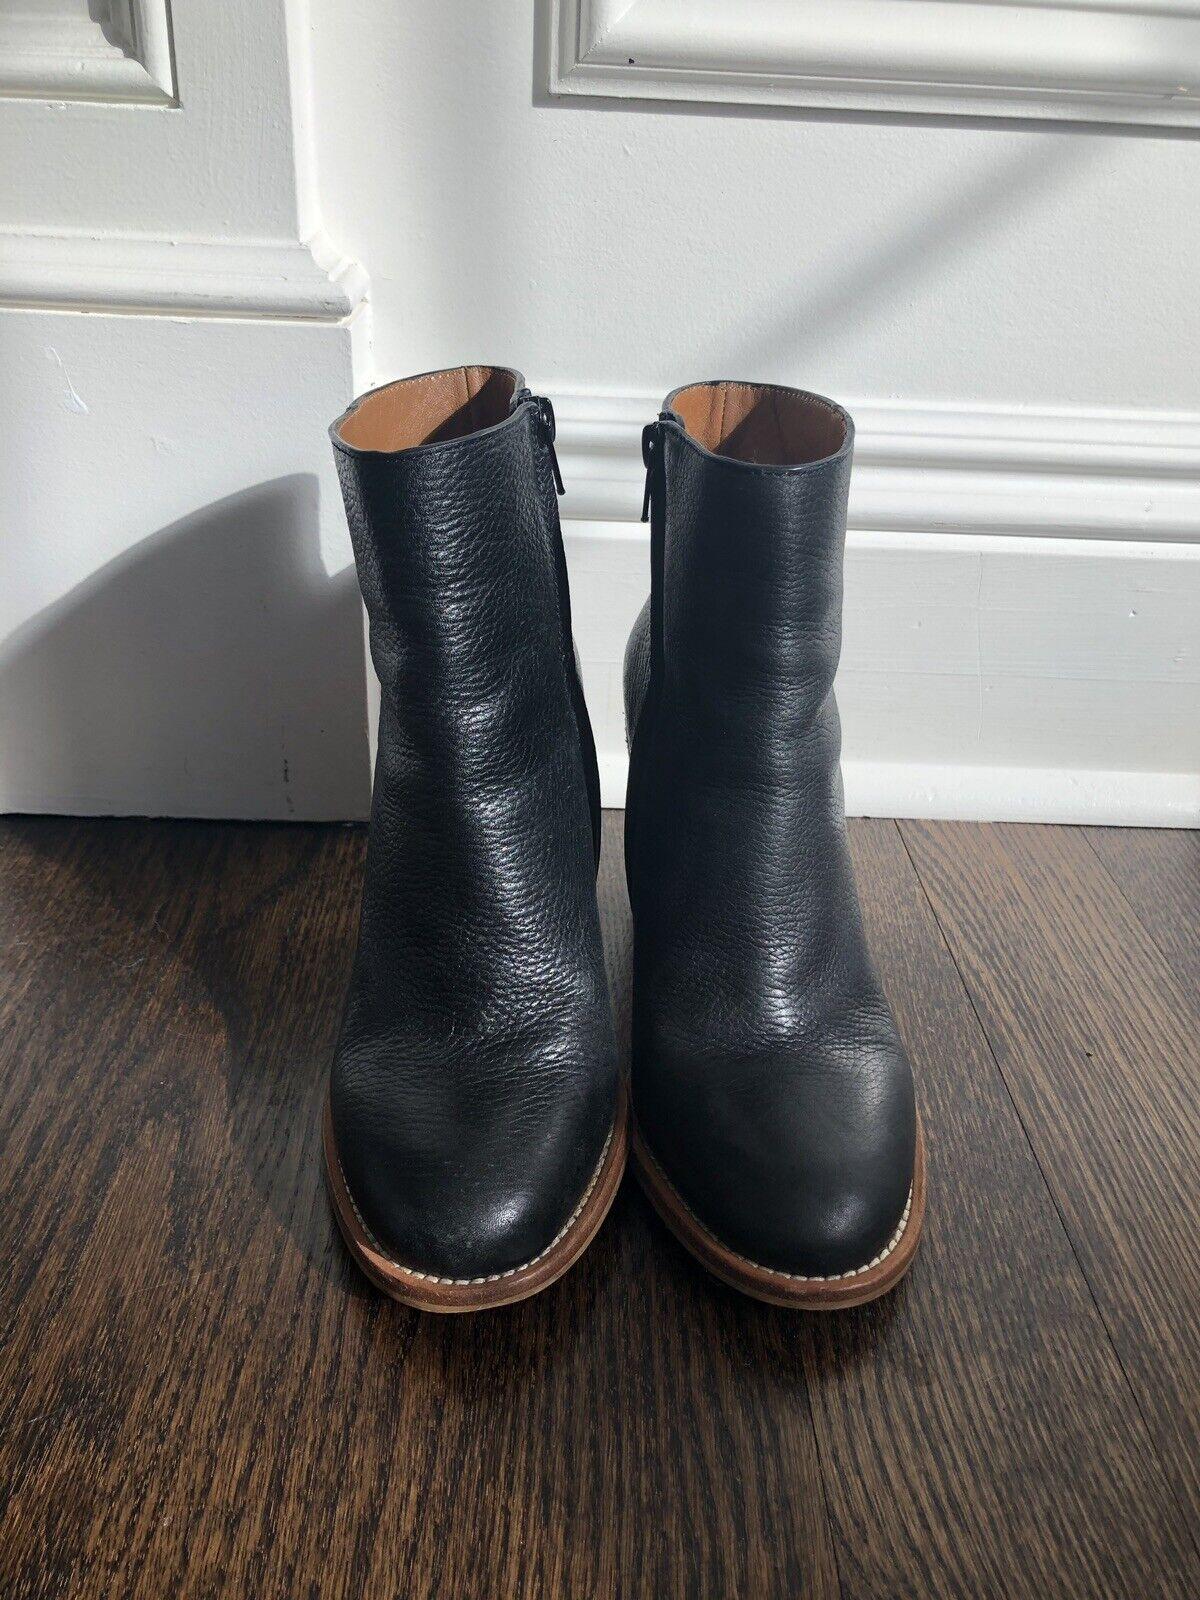 SEE BY CHLOE en cuir noir bois Plateforme Bottines Chaussons SZ 37 1 2